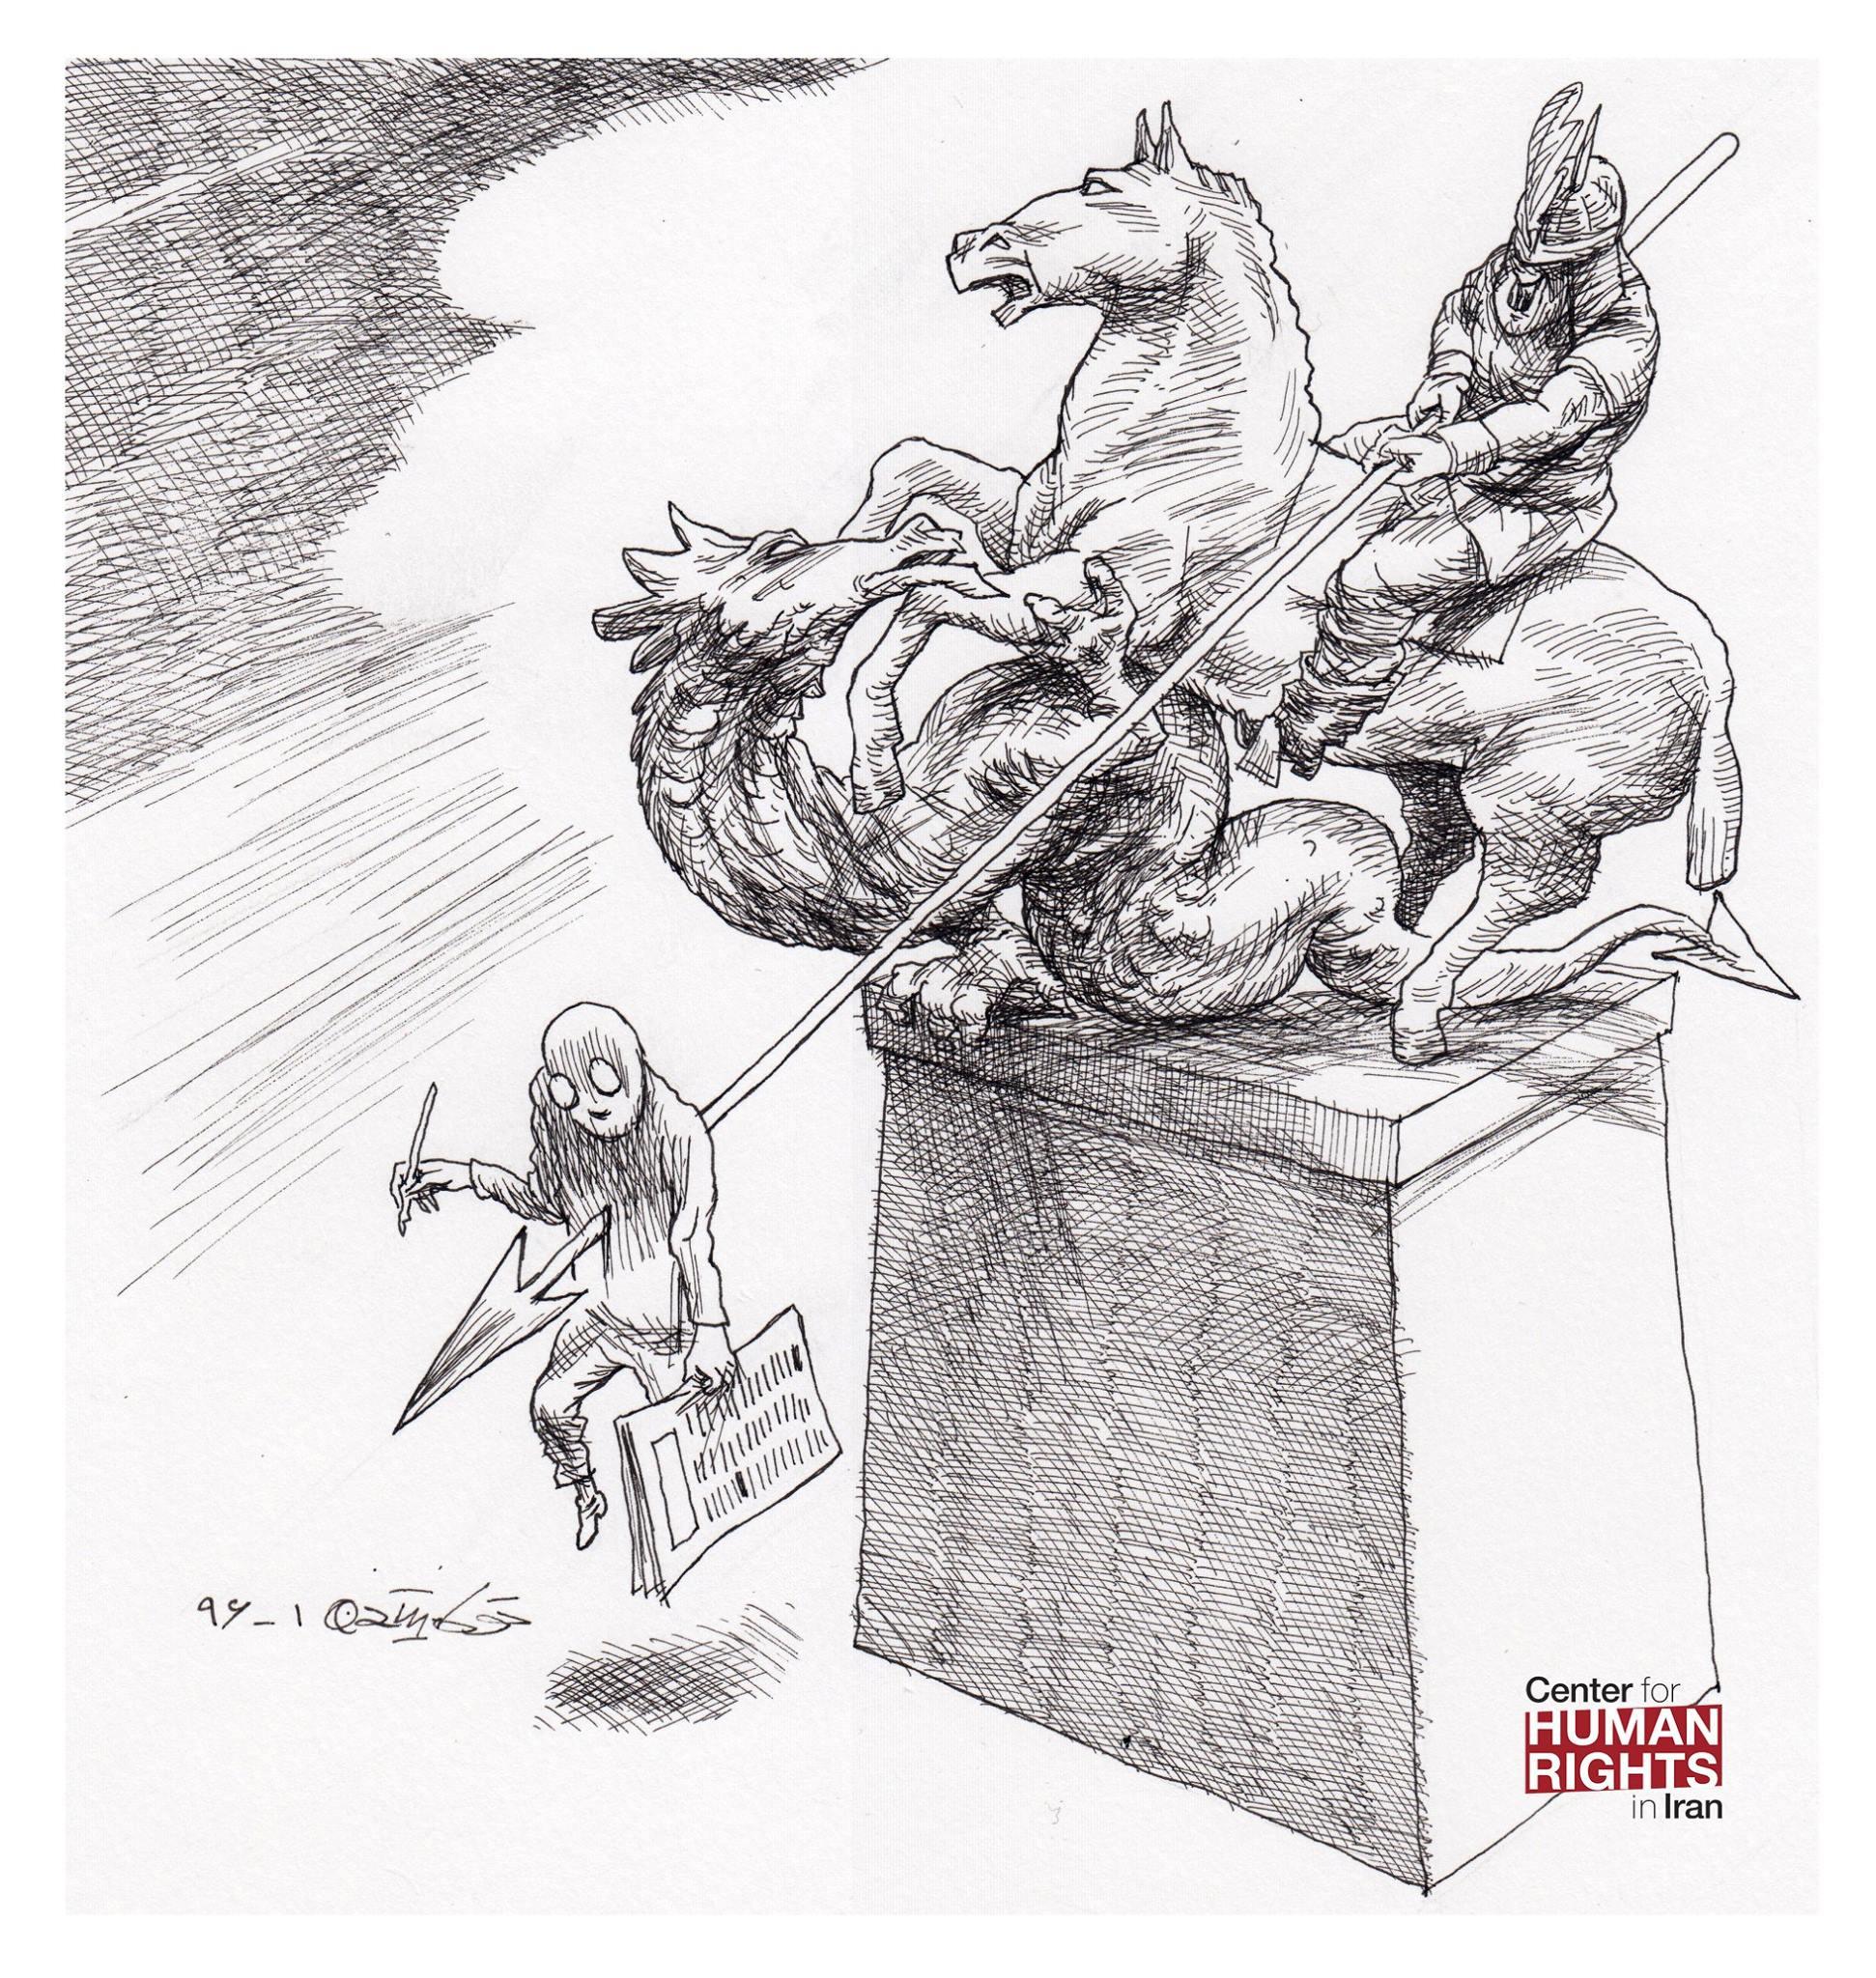 Cartoon 164: Freedom of Speech